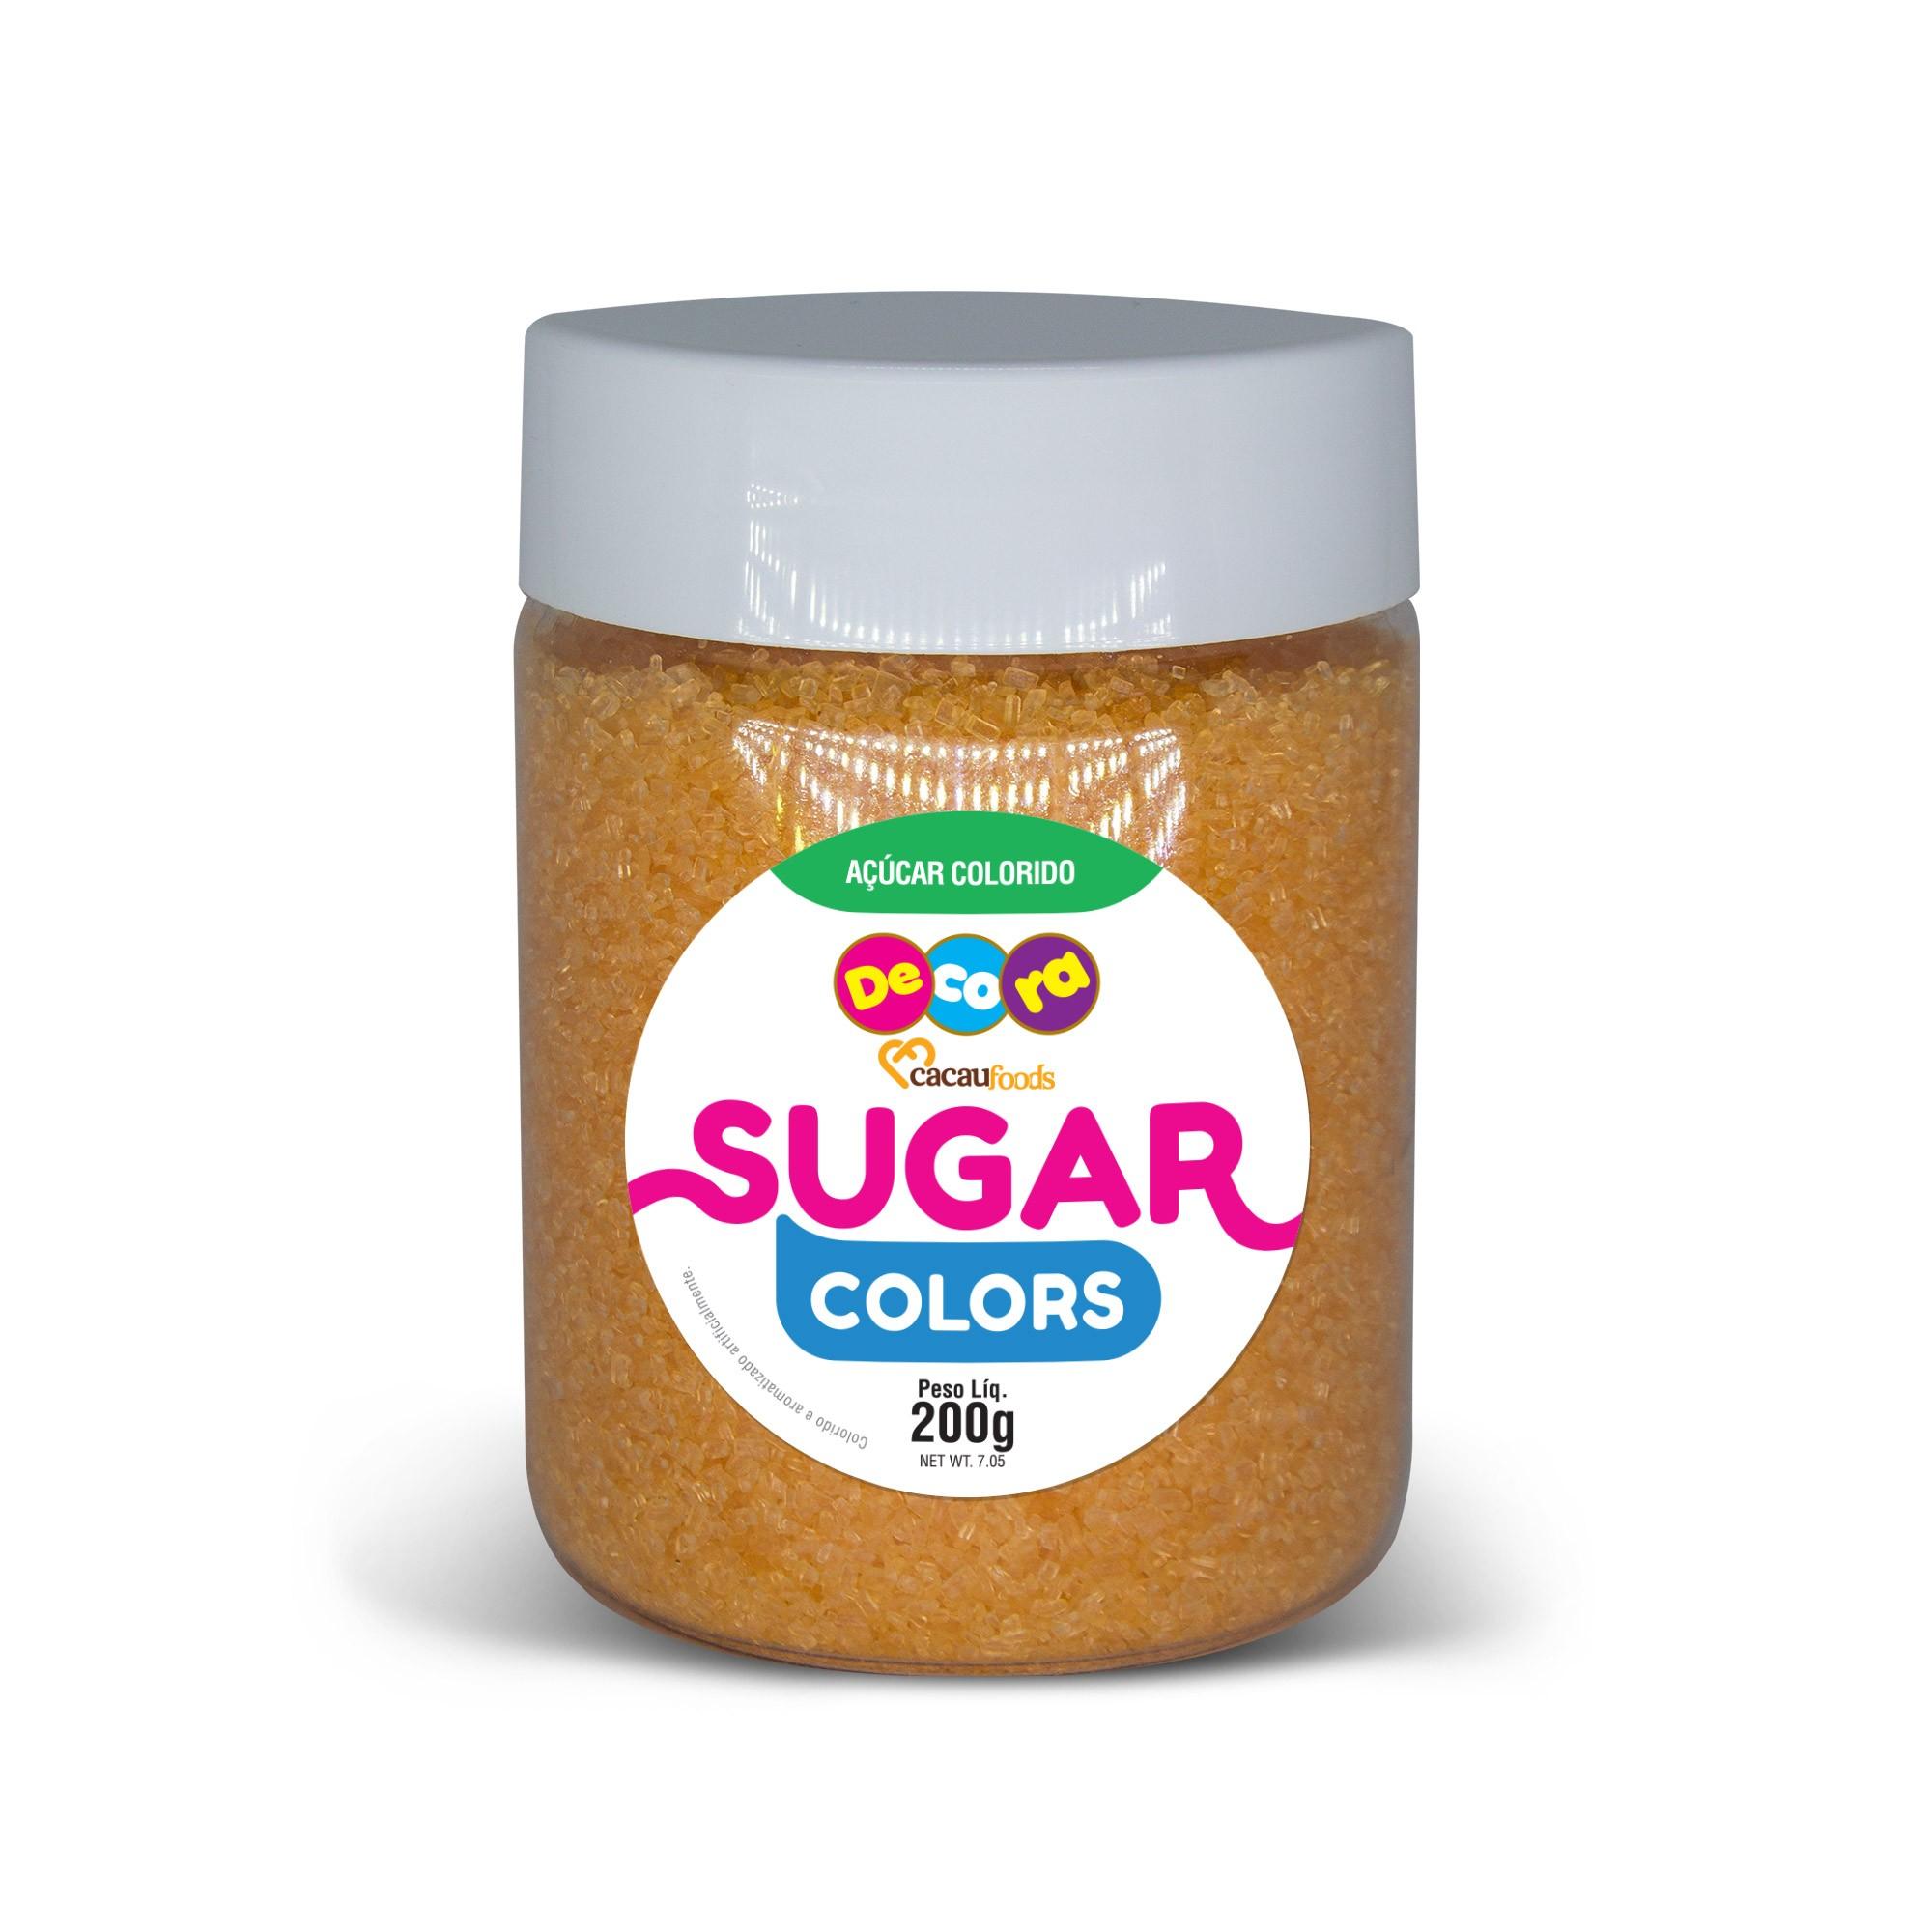 Açúcar Colorido Sugar Colors Laranja 200g